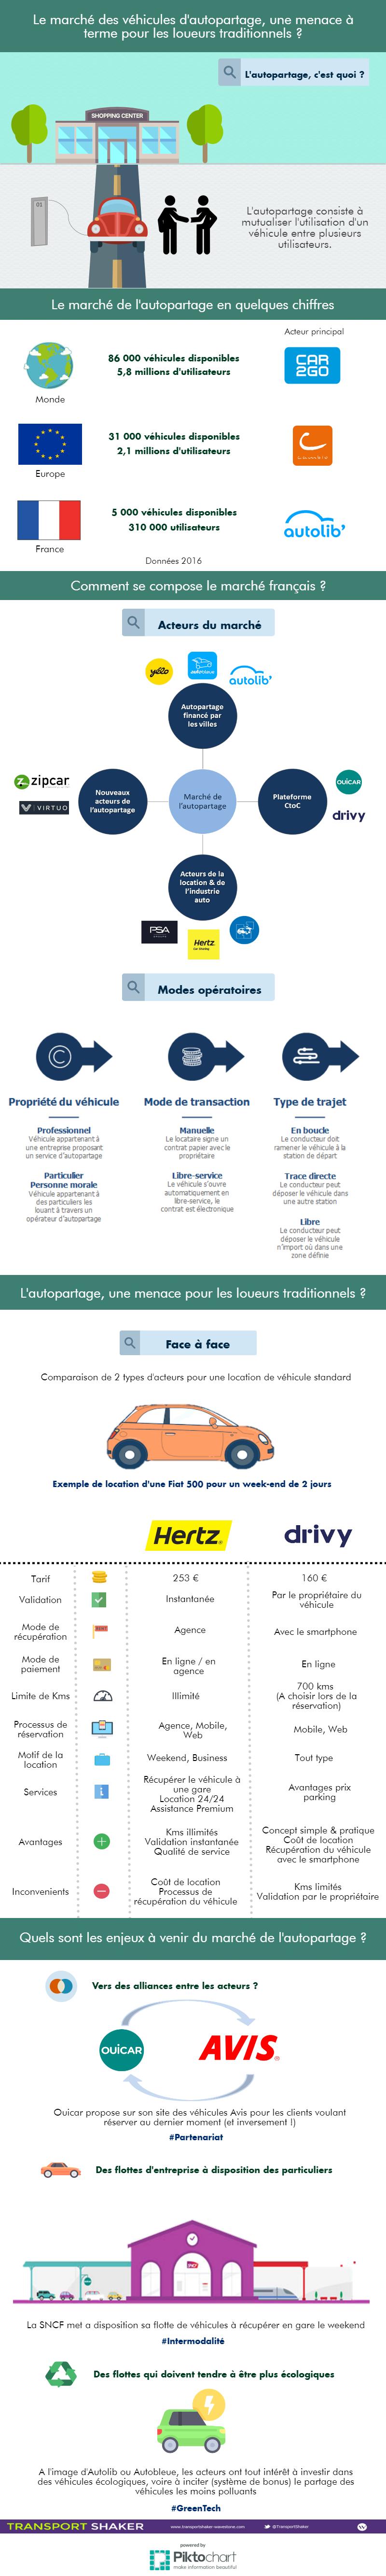 infographie autopartage V2